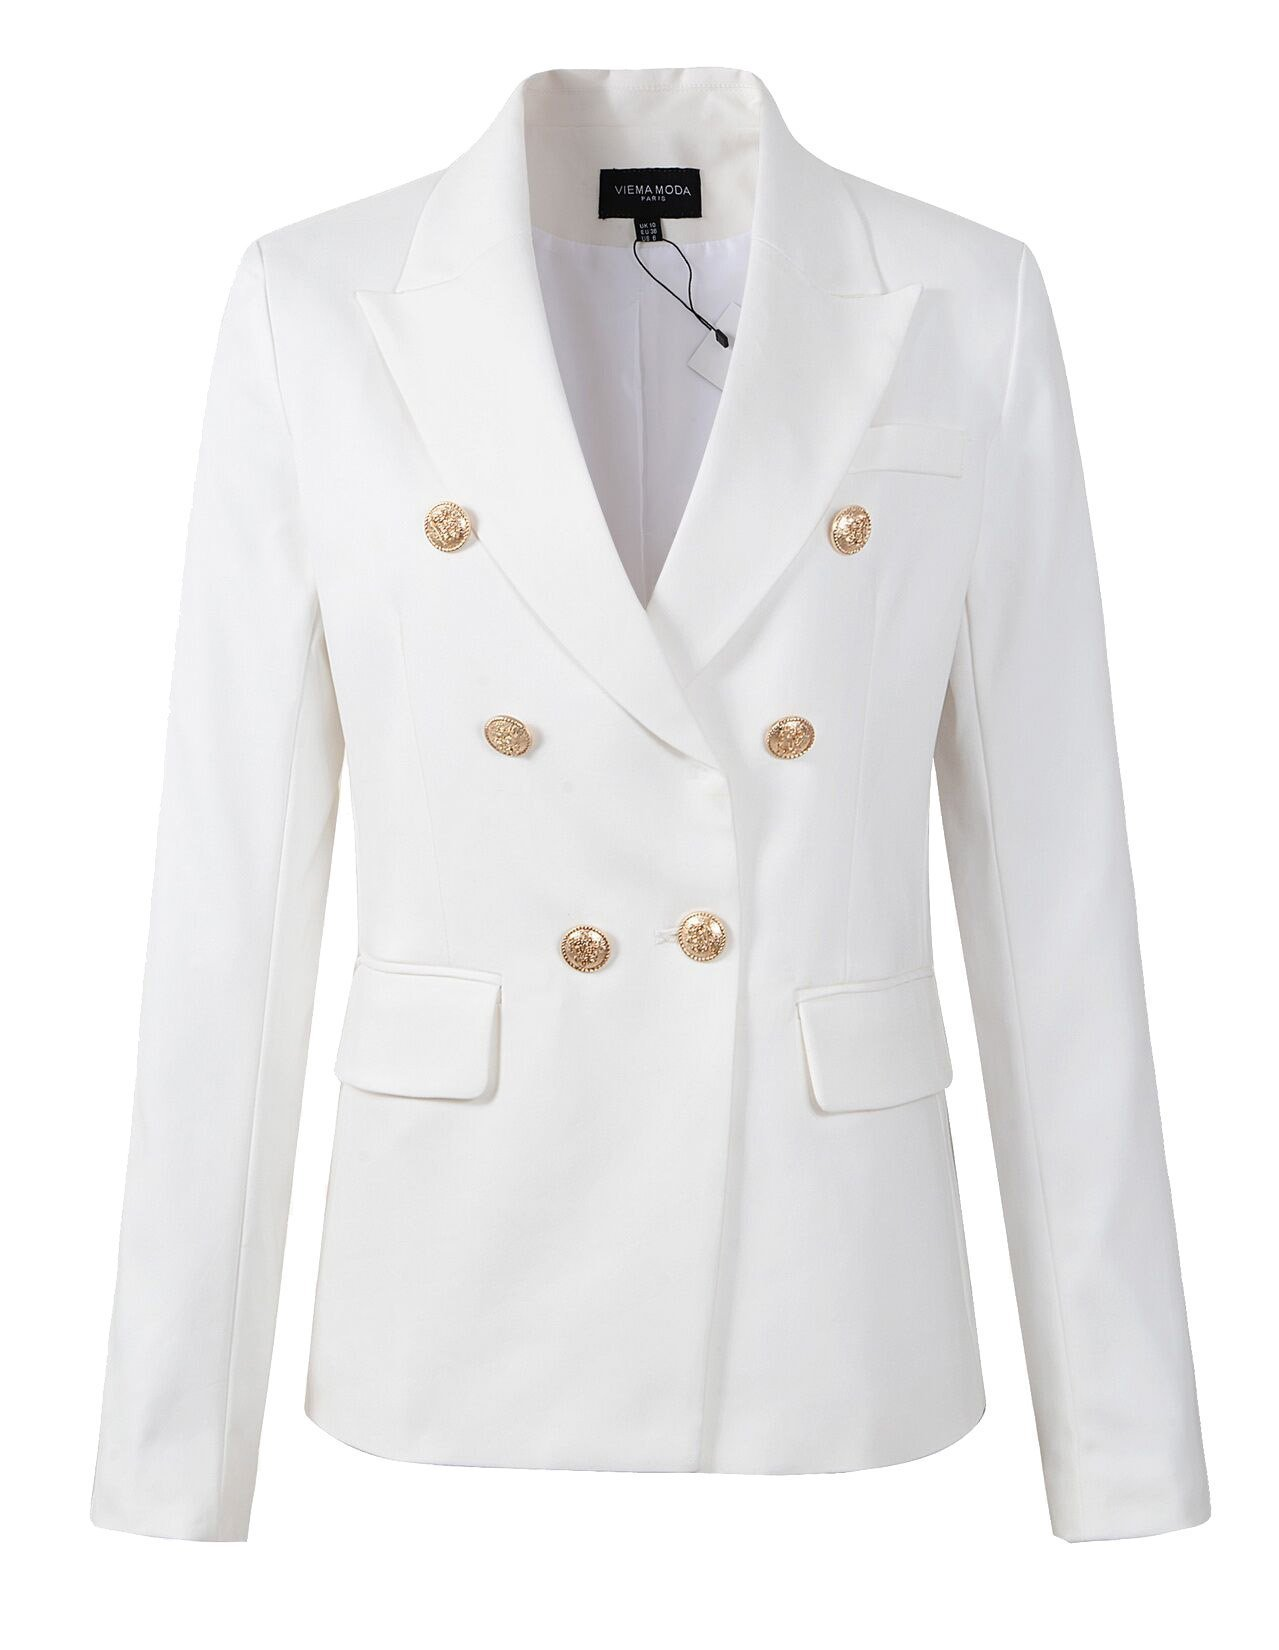 VIEMA MODA Womens Double Breasted Military Style Blazer Ladies Coat Jacket (US6, White)